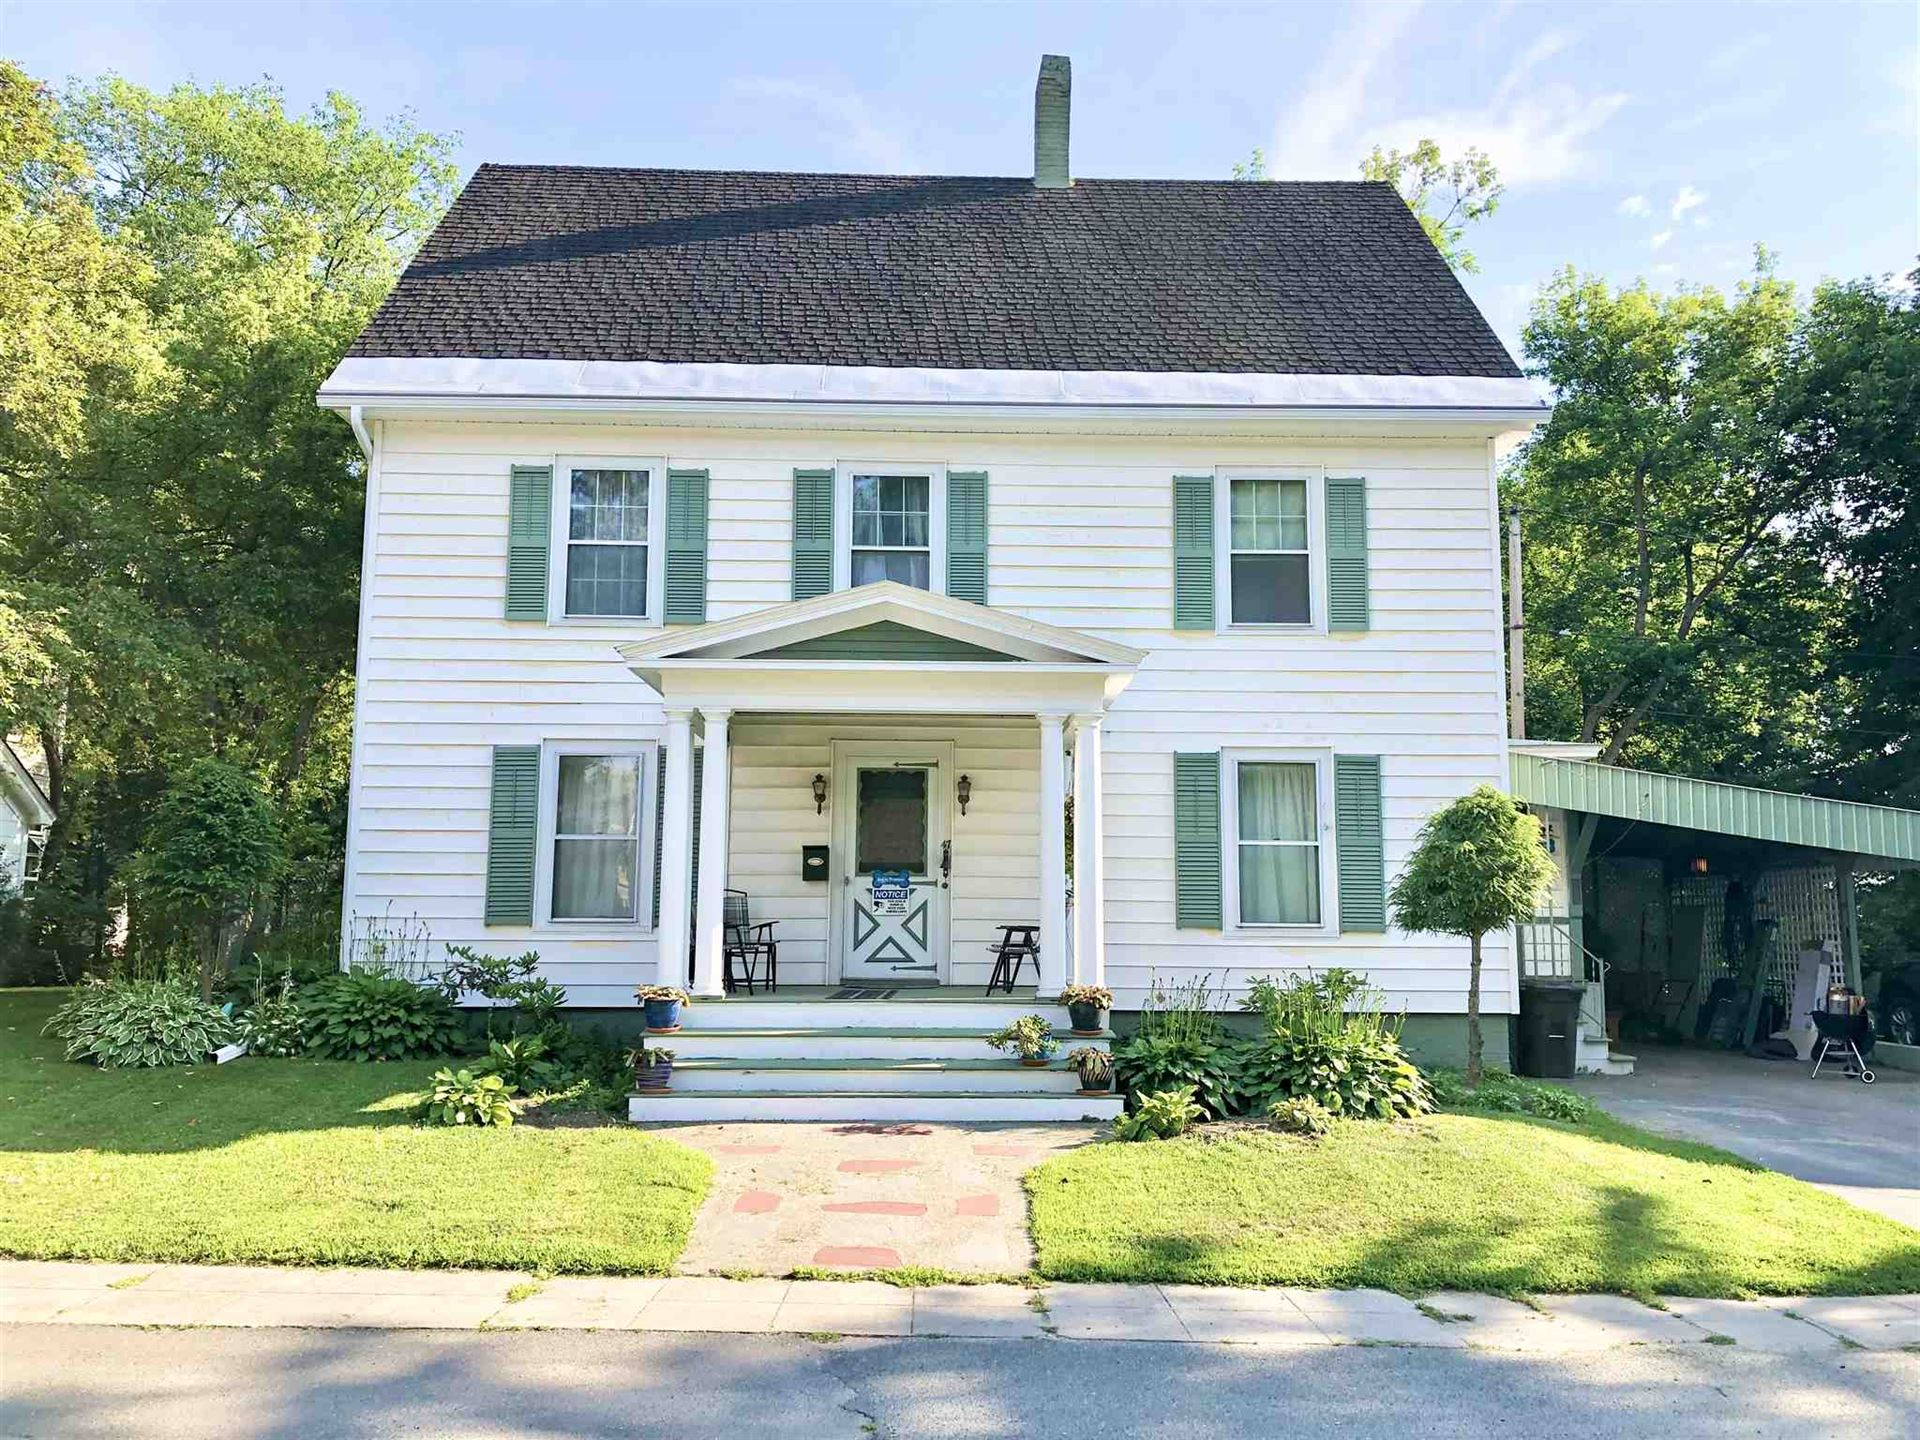 47 Cary Place, Saint Johnsbury, VT 05819 - MLS#: 4816150